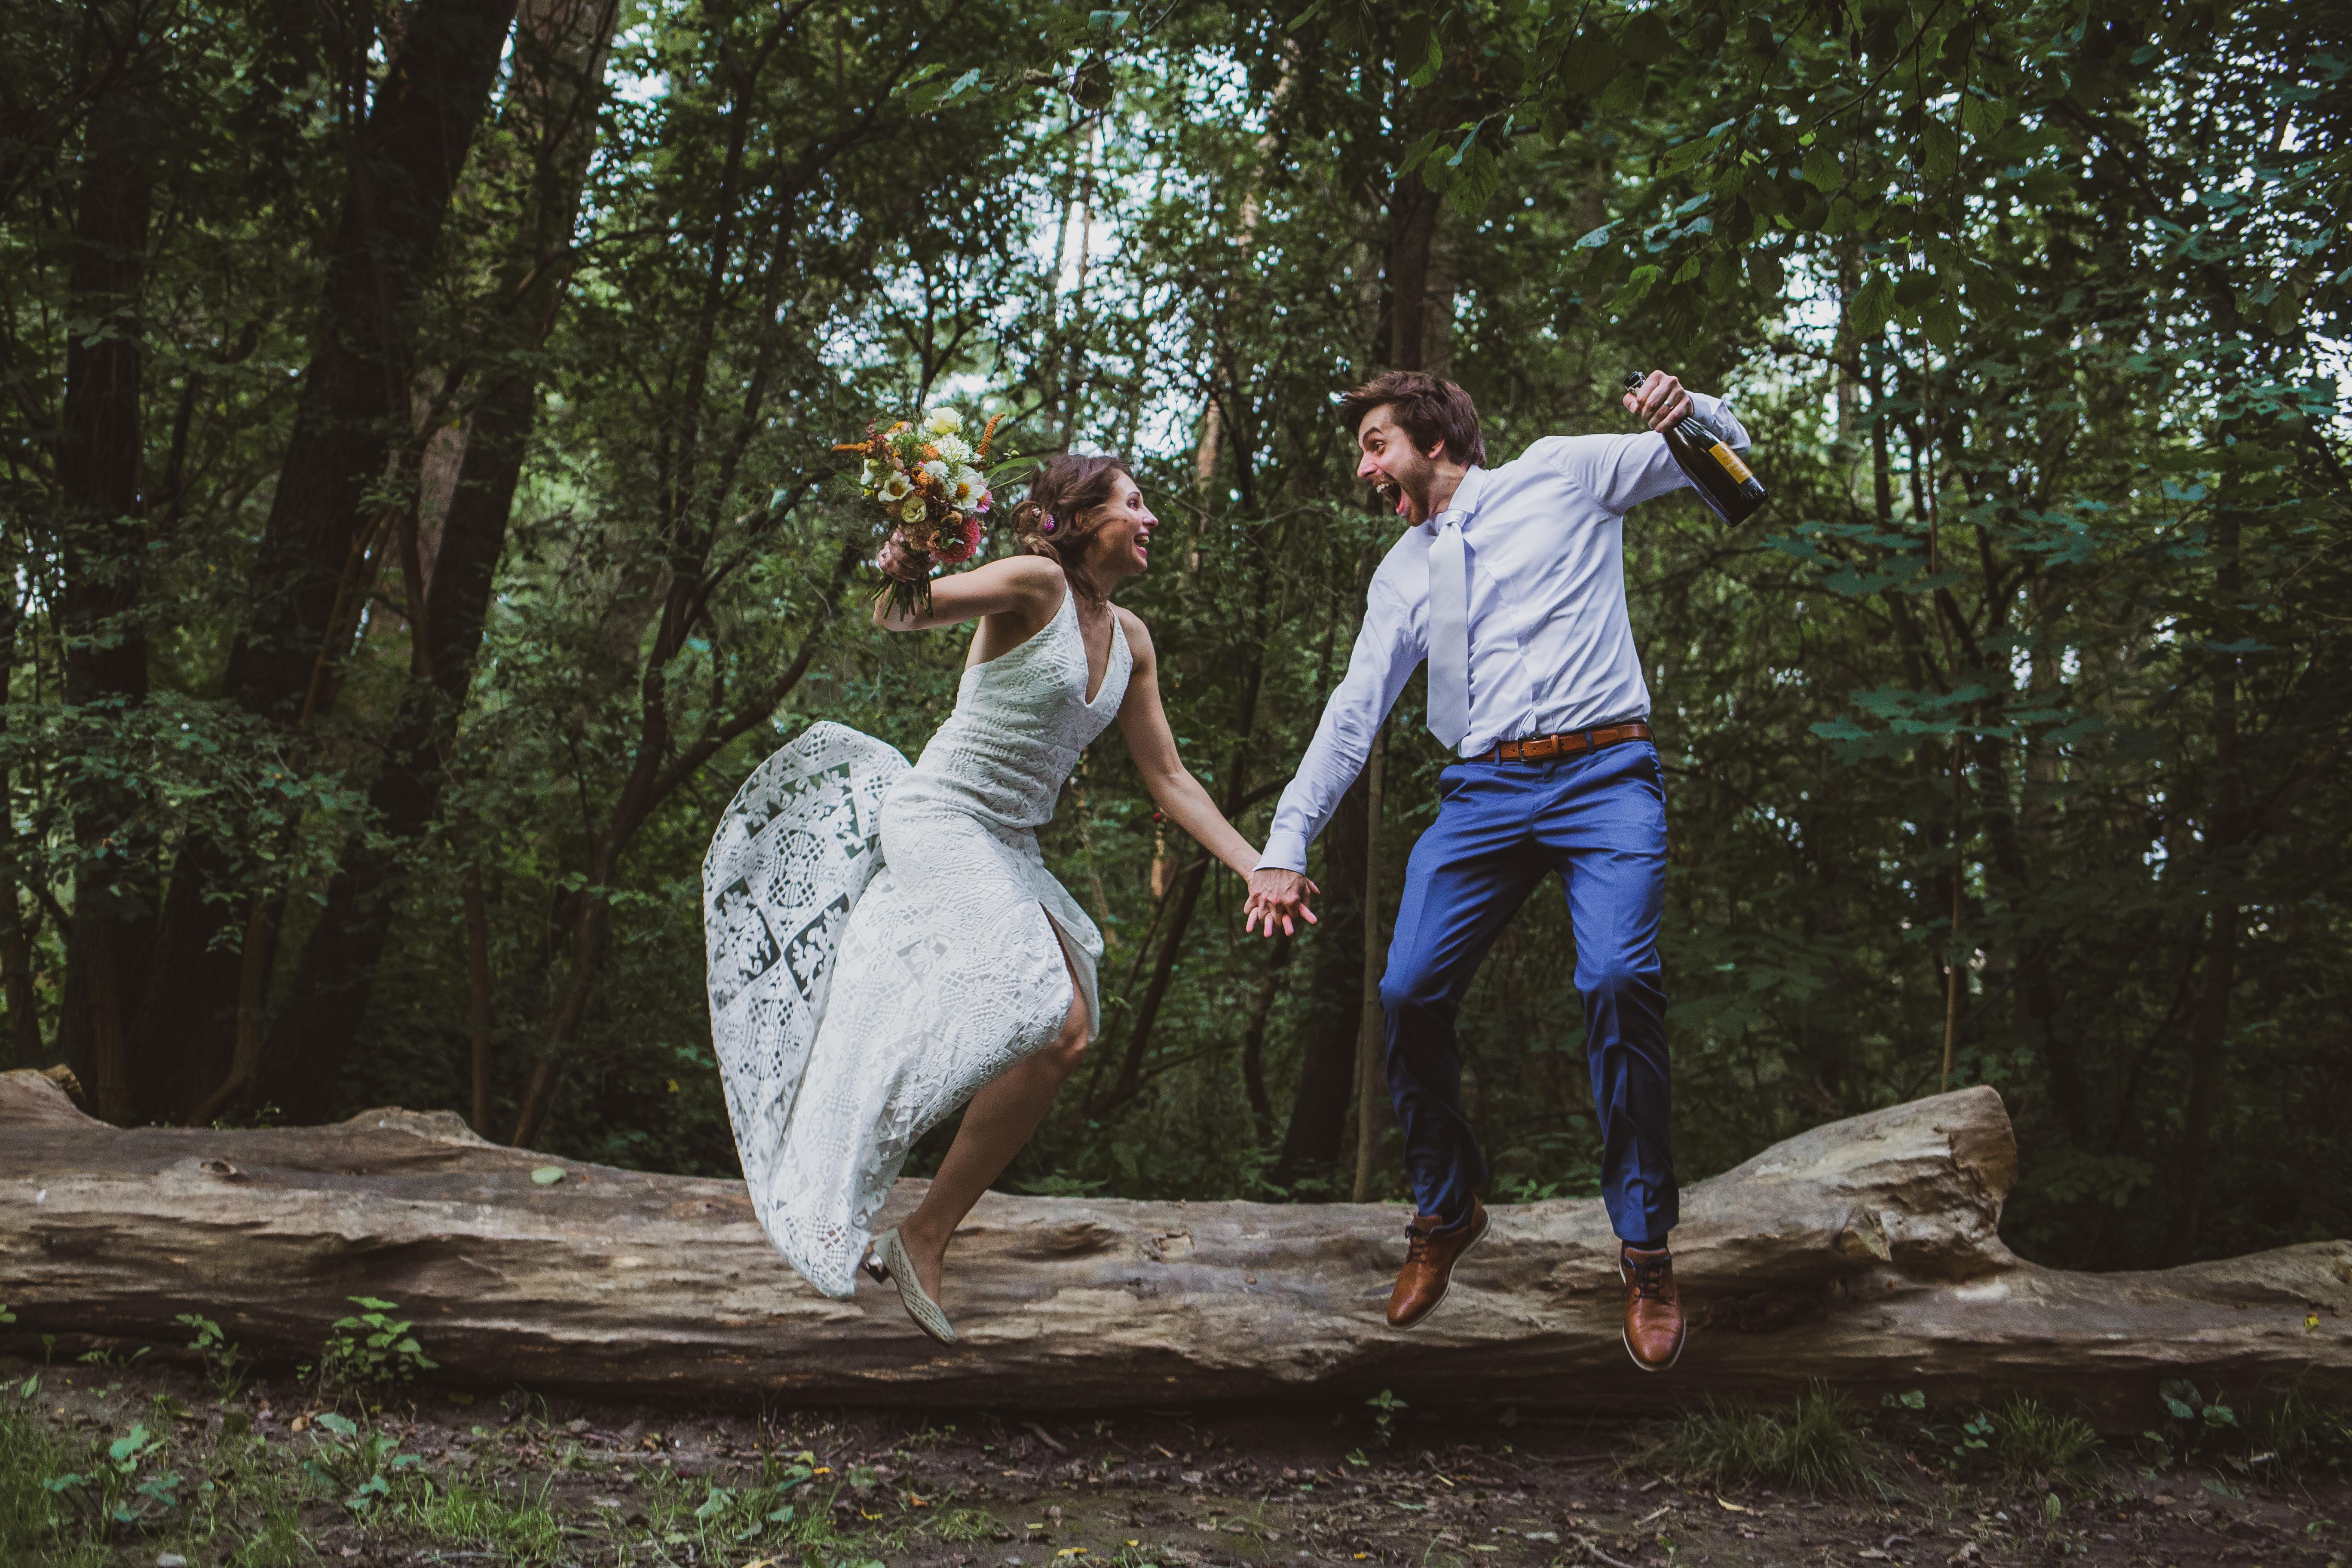 Action wedding photography